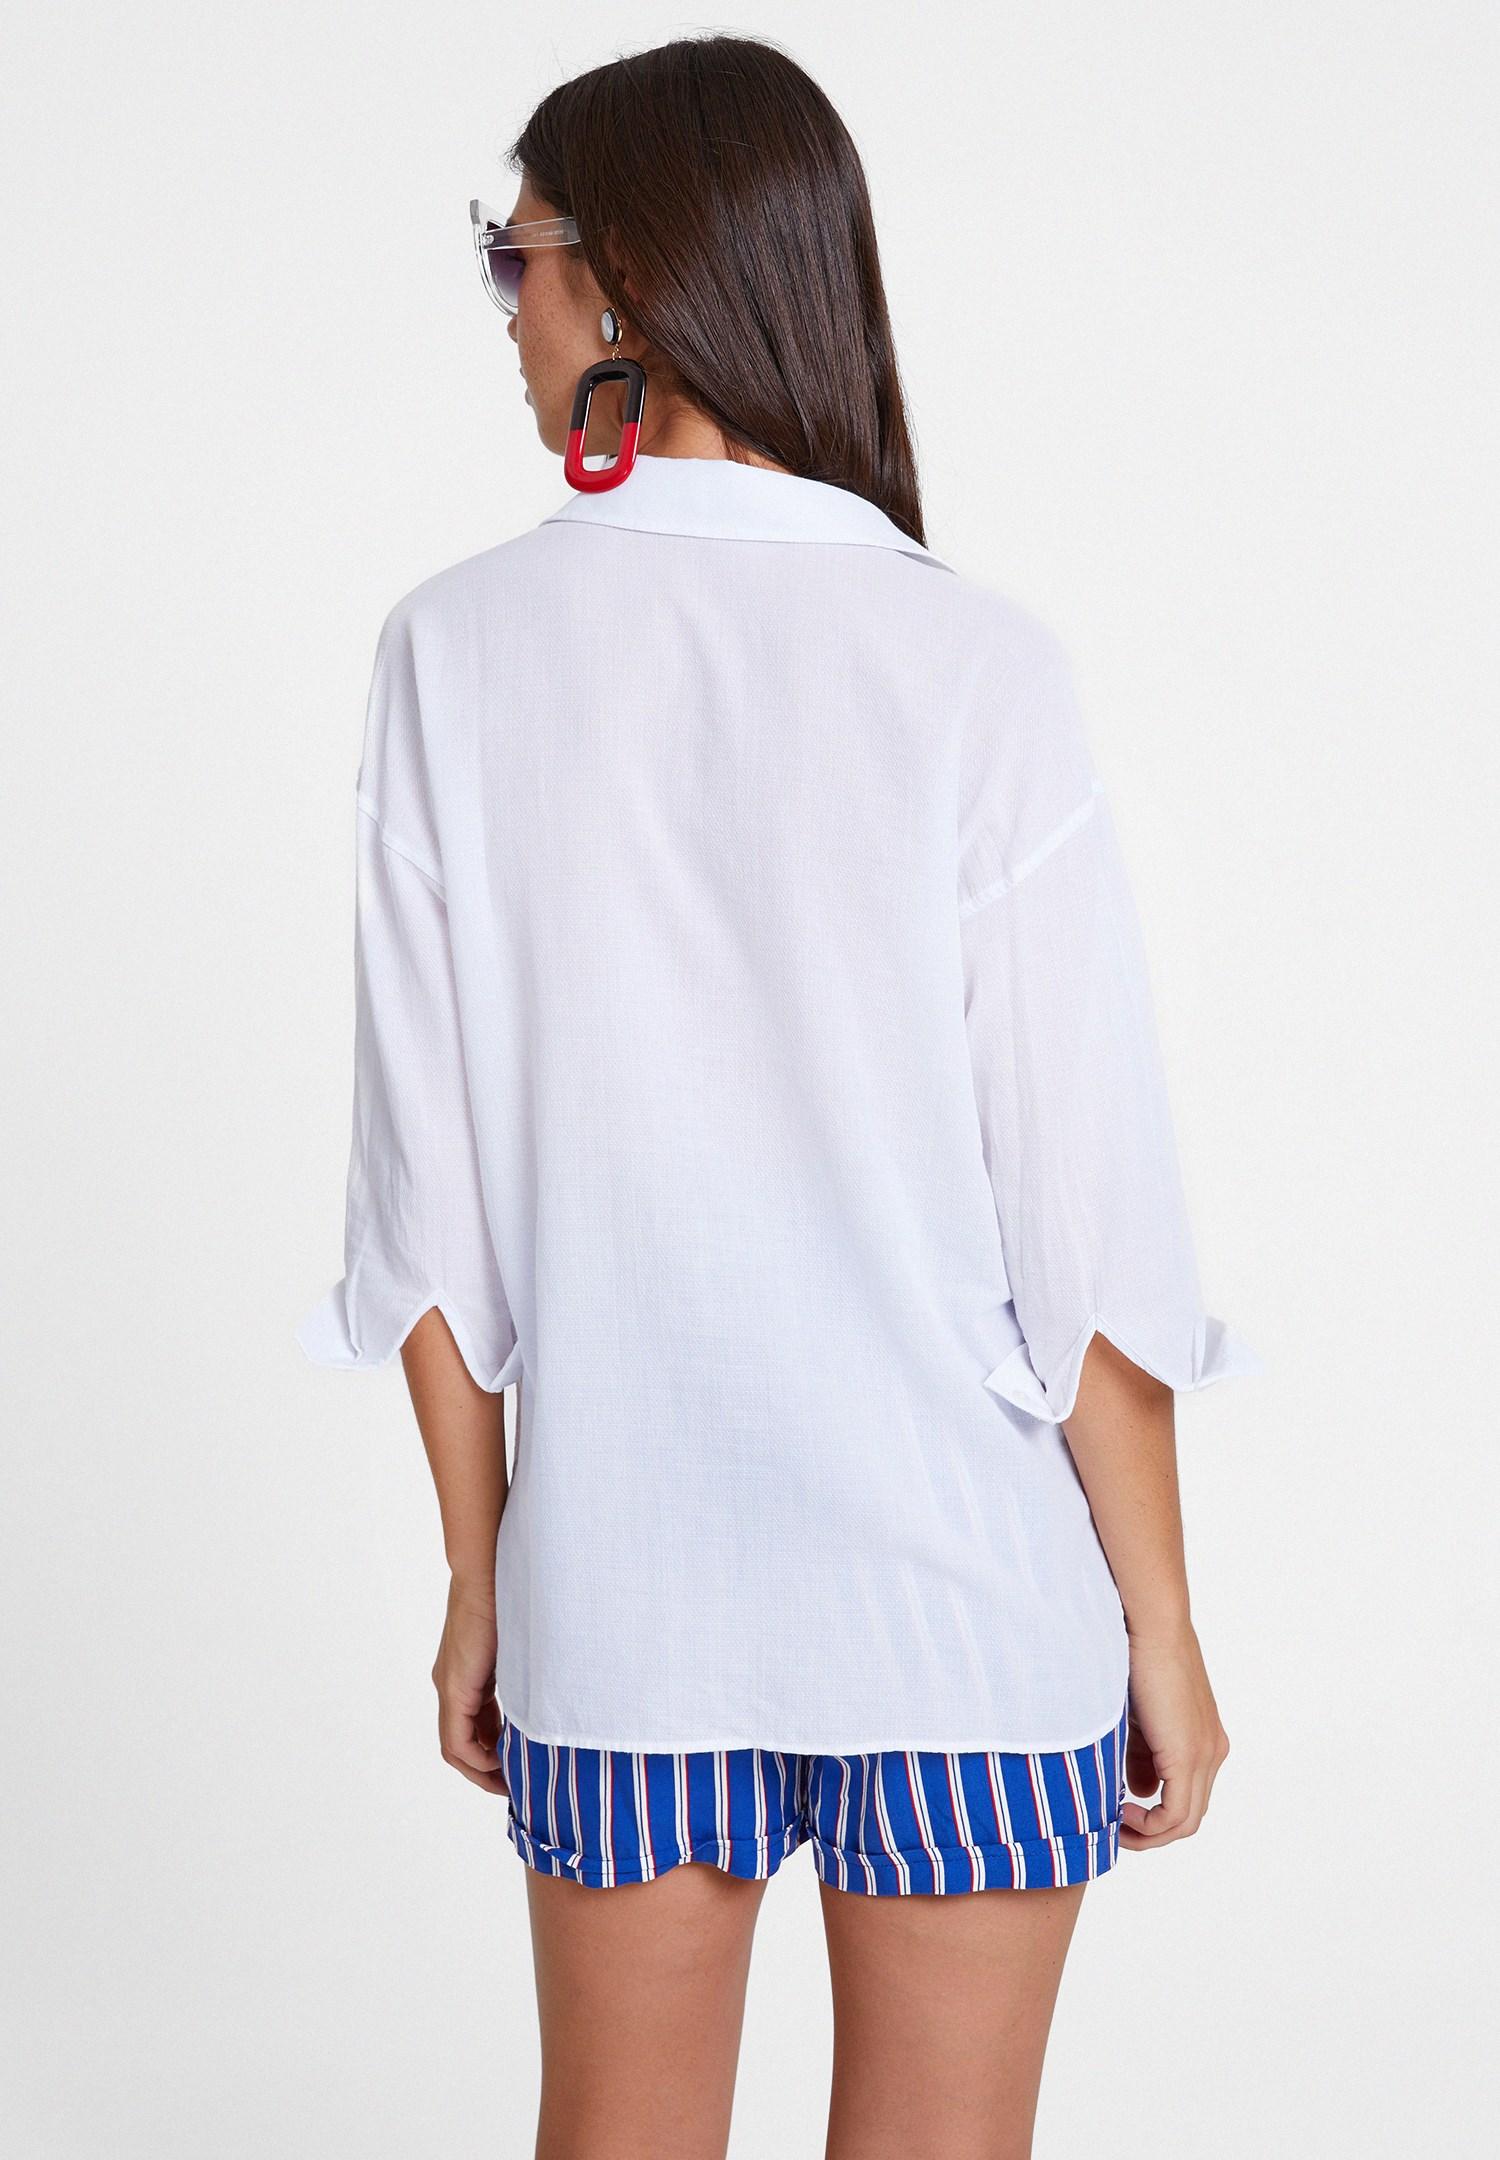 Women White Cotton Shirt with Pocket